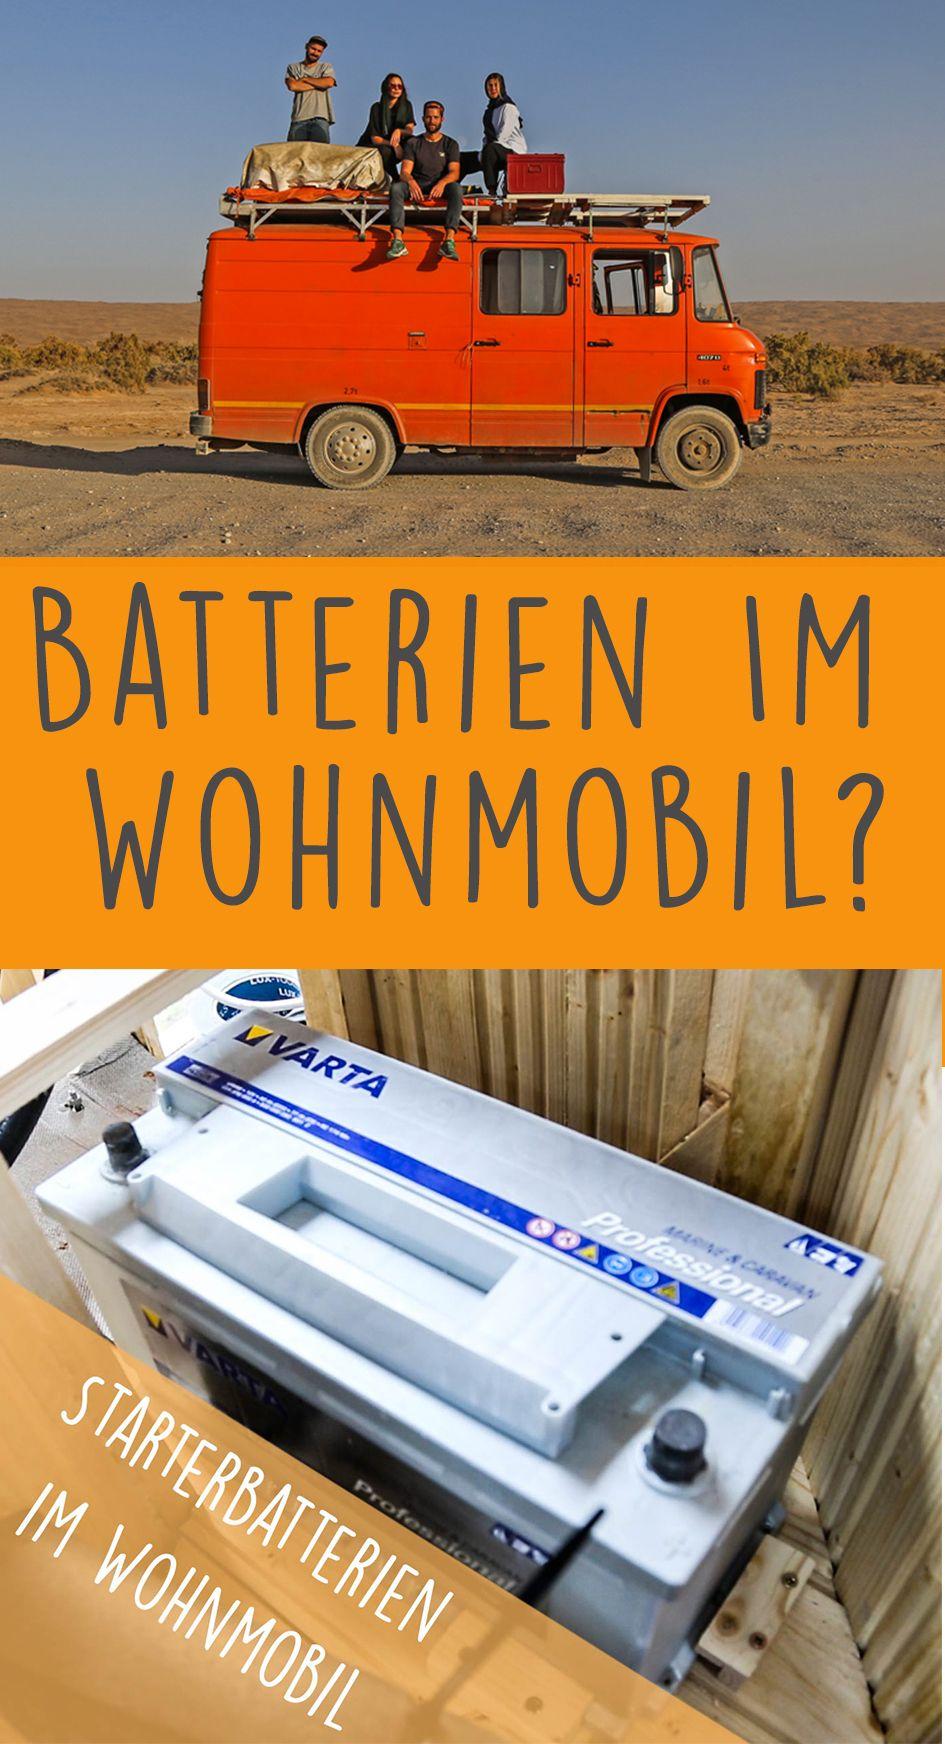 batterie wohnmobil die beste bordbatterie gibt es nicht. Black Bedroom Furniture Sets. Home Design Ideas